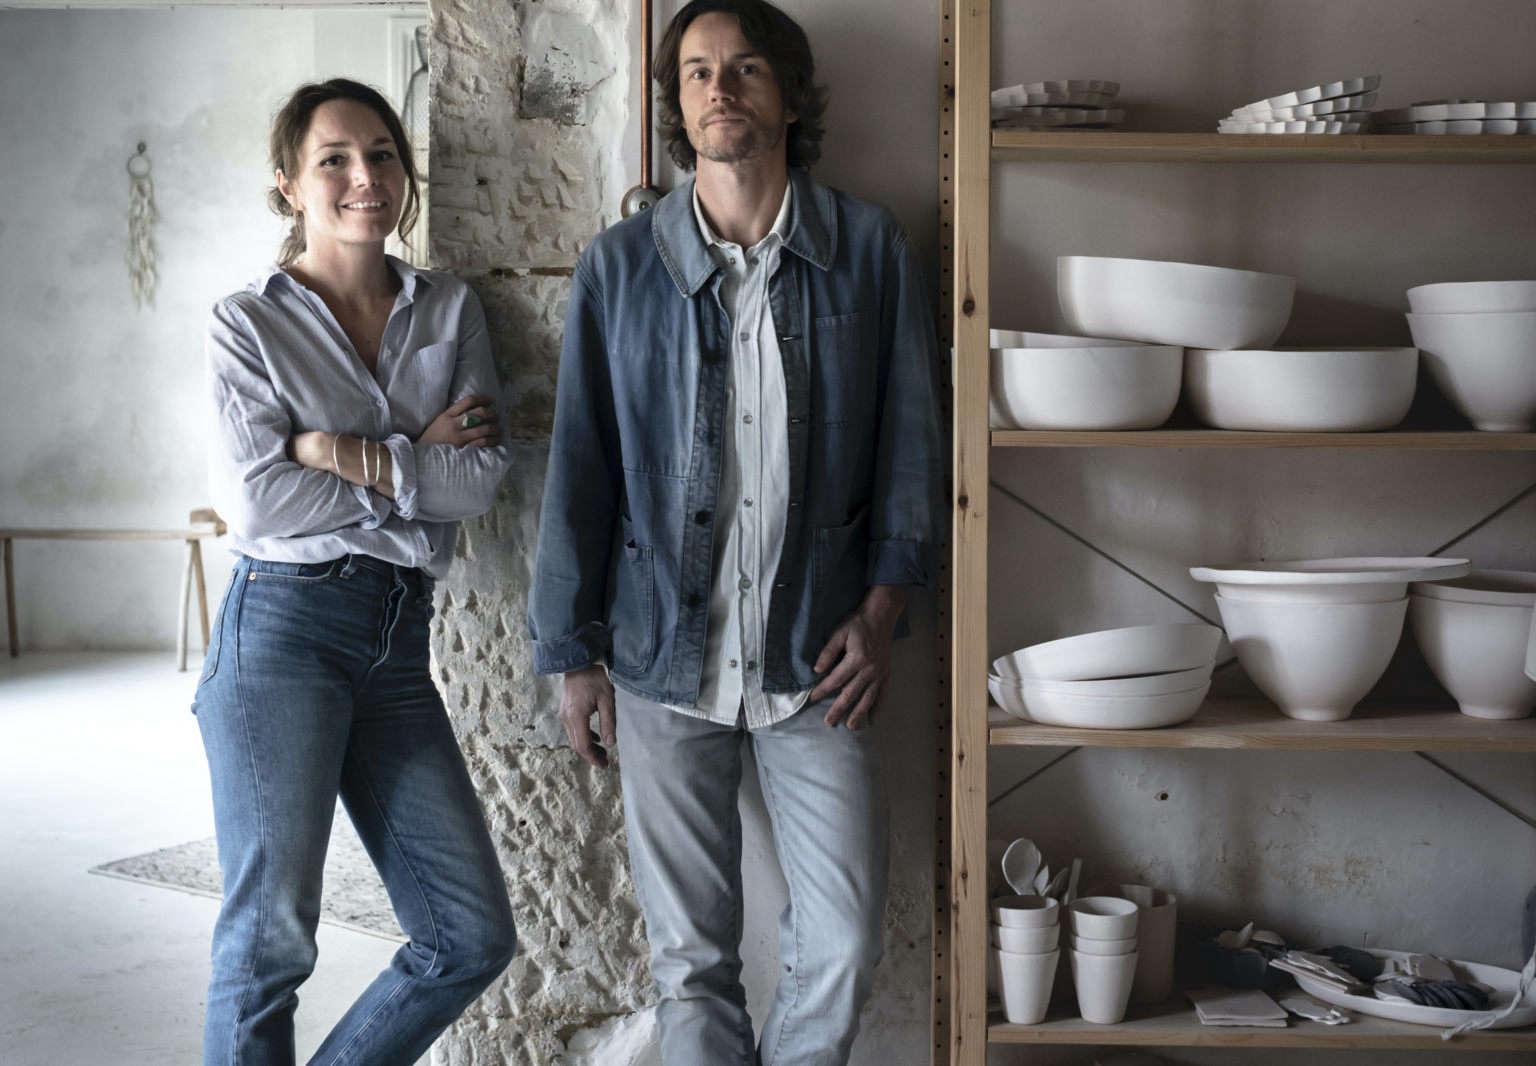 justine and jean hay de slate in the epure studio haute saintonge france hero 1